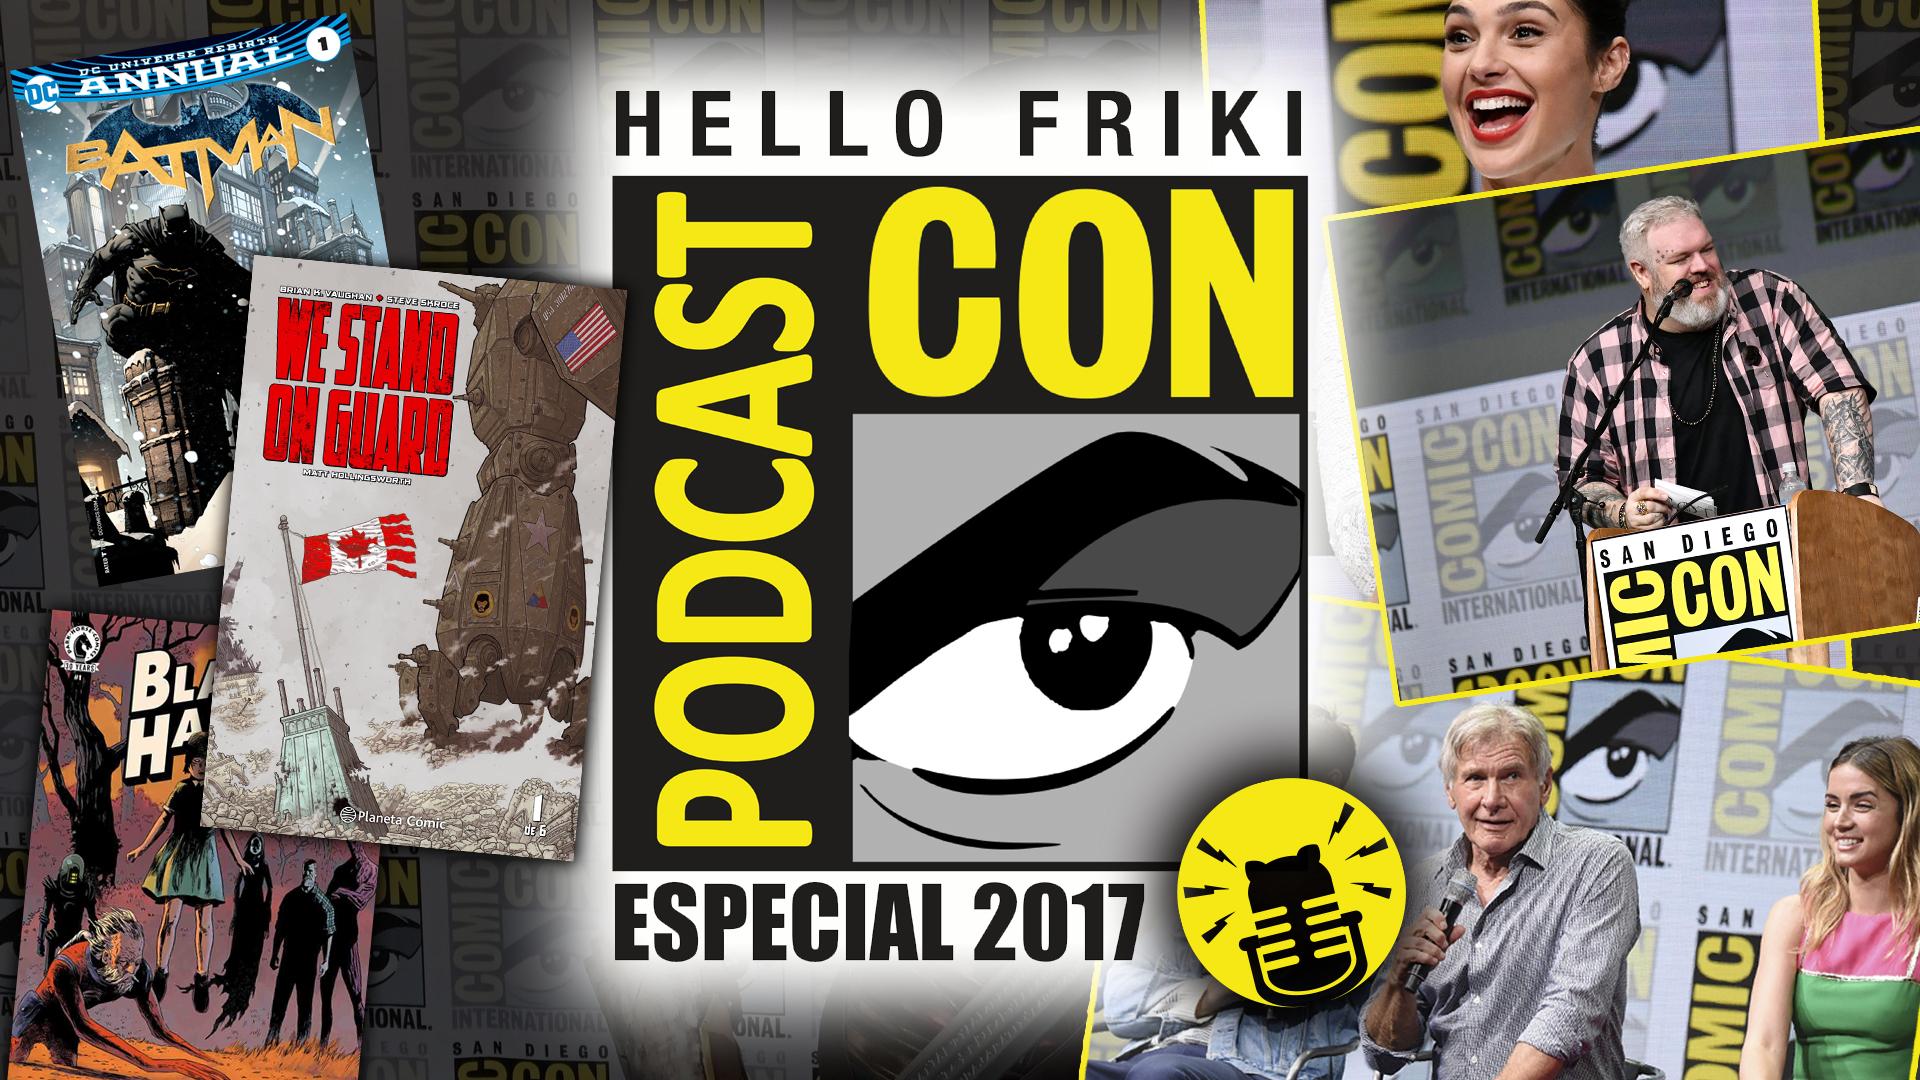 HF Especial Comic Con 2017